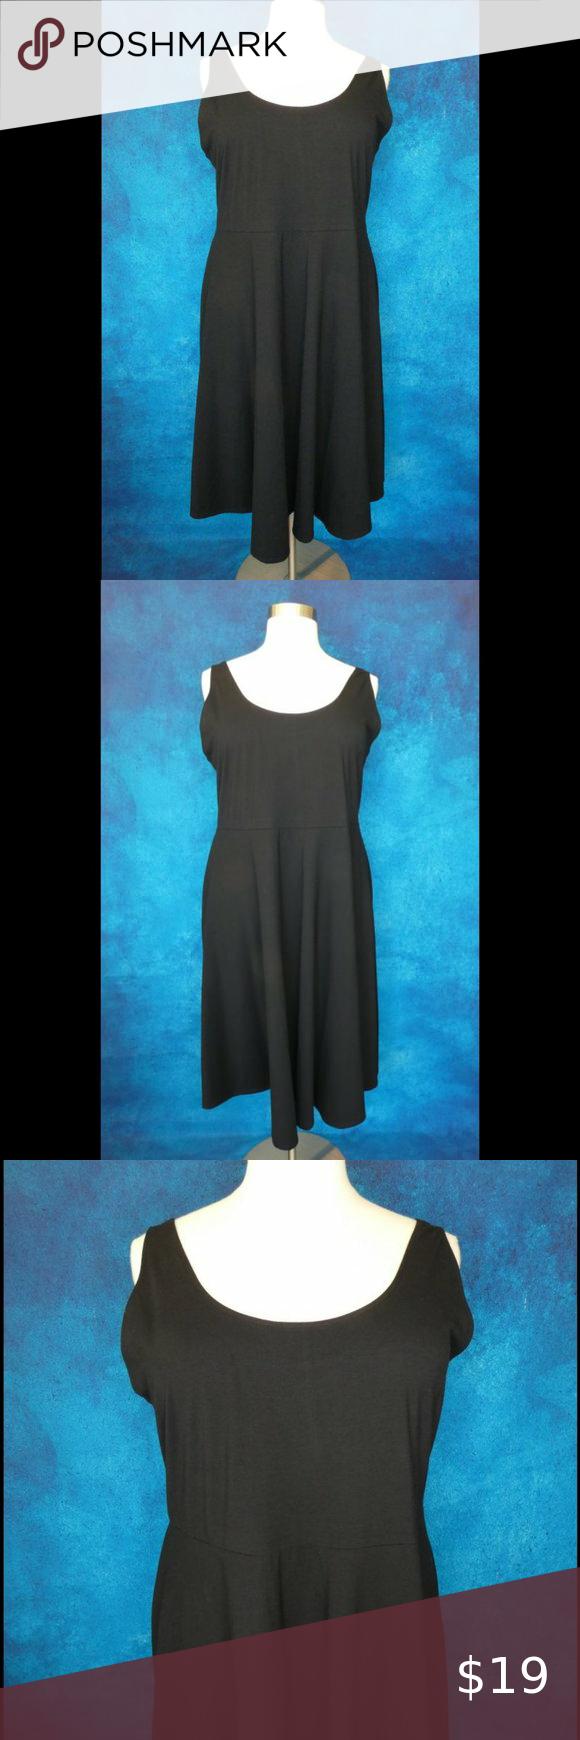 Nwt A New Day Black A Line Dress 2x A Line Dress Dresses 2x Clothes Design [ 1740 x 580 Pixel ]